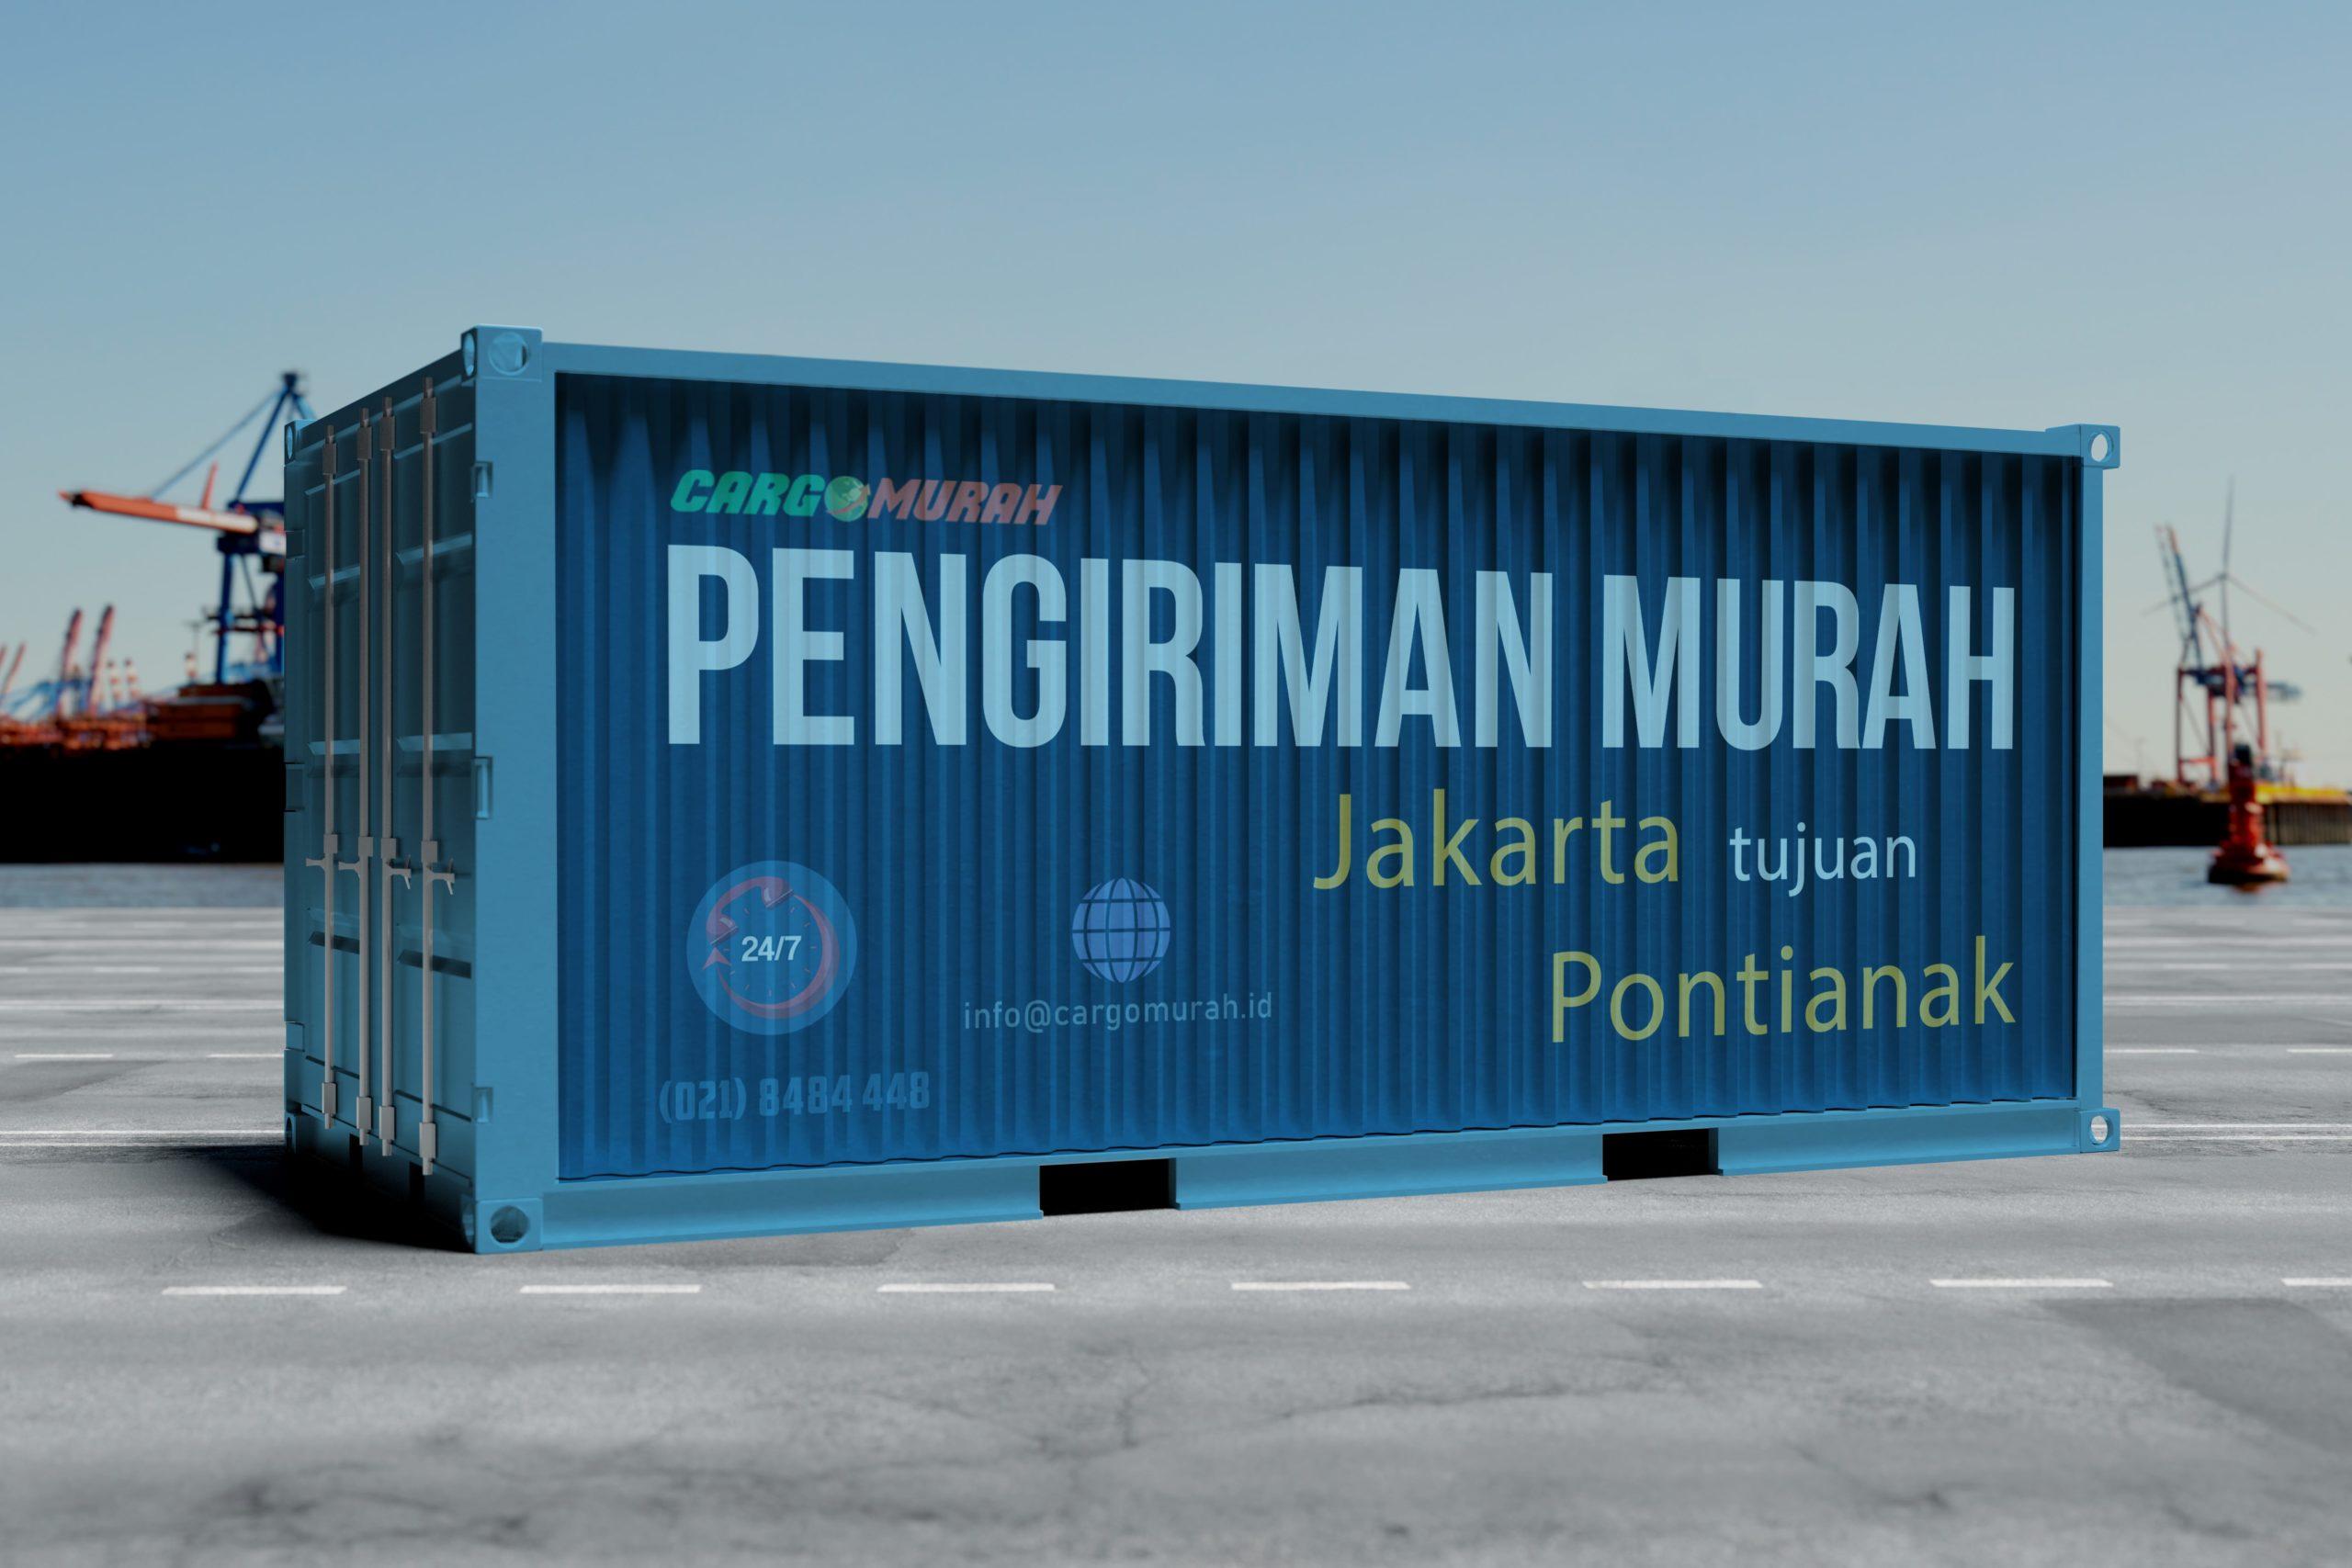 Ekspedisi Murah Jakarta ke Pontianak Kalimantan Barat